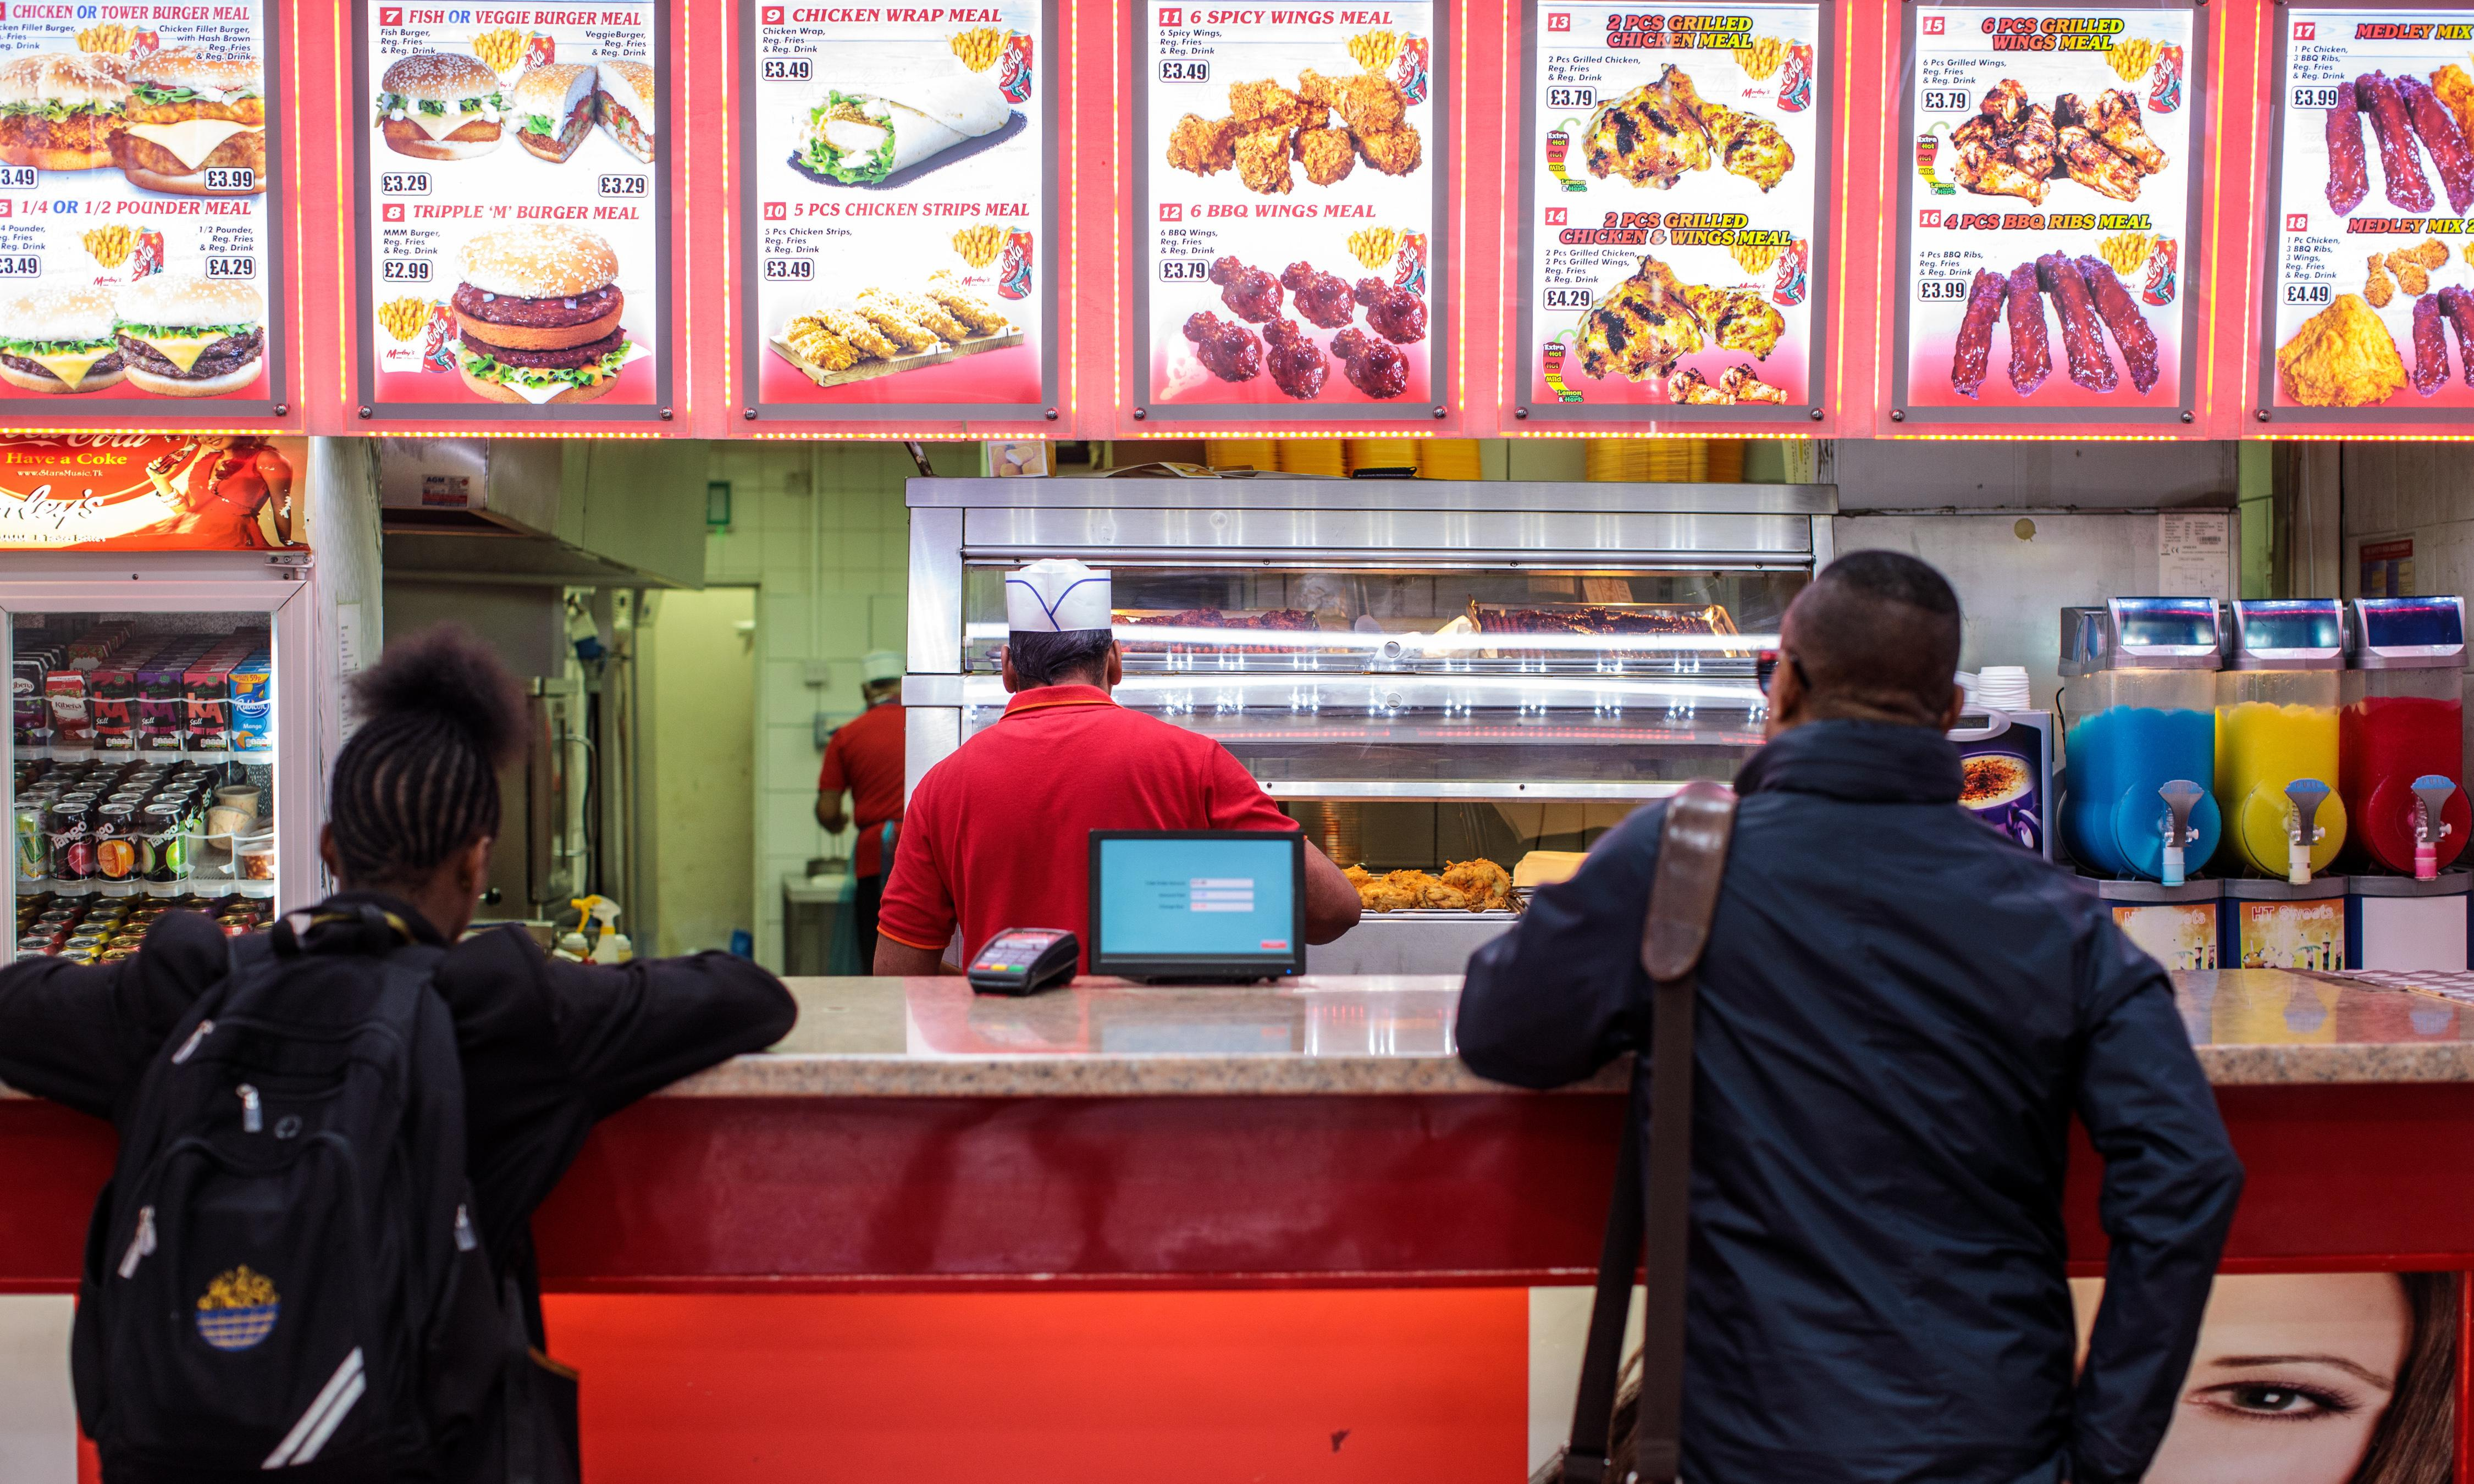 Junk food cravings linked to lack of sleep, study suggests